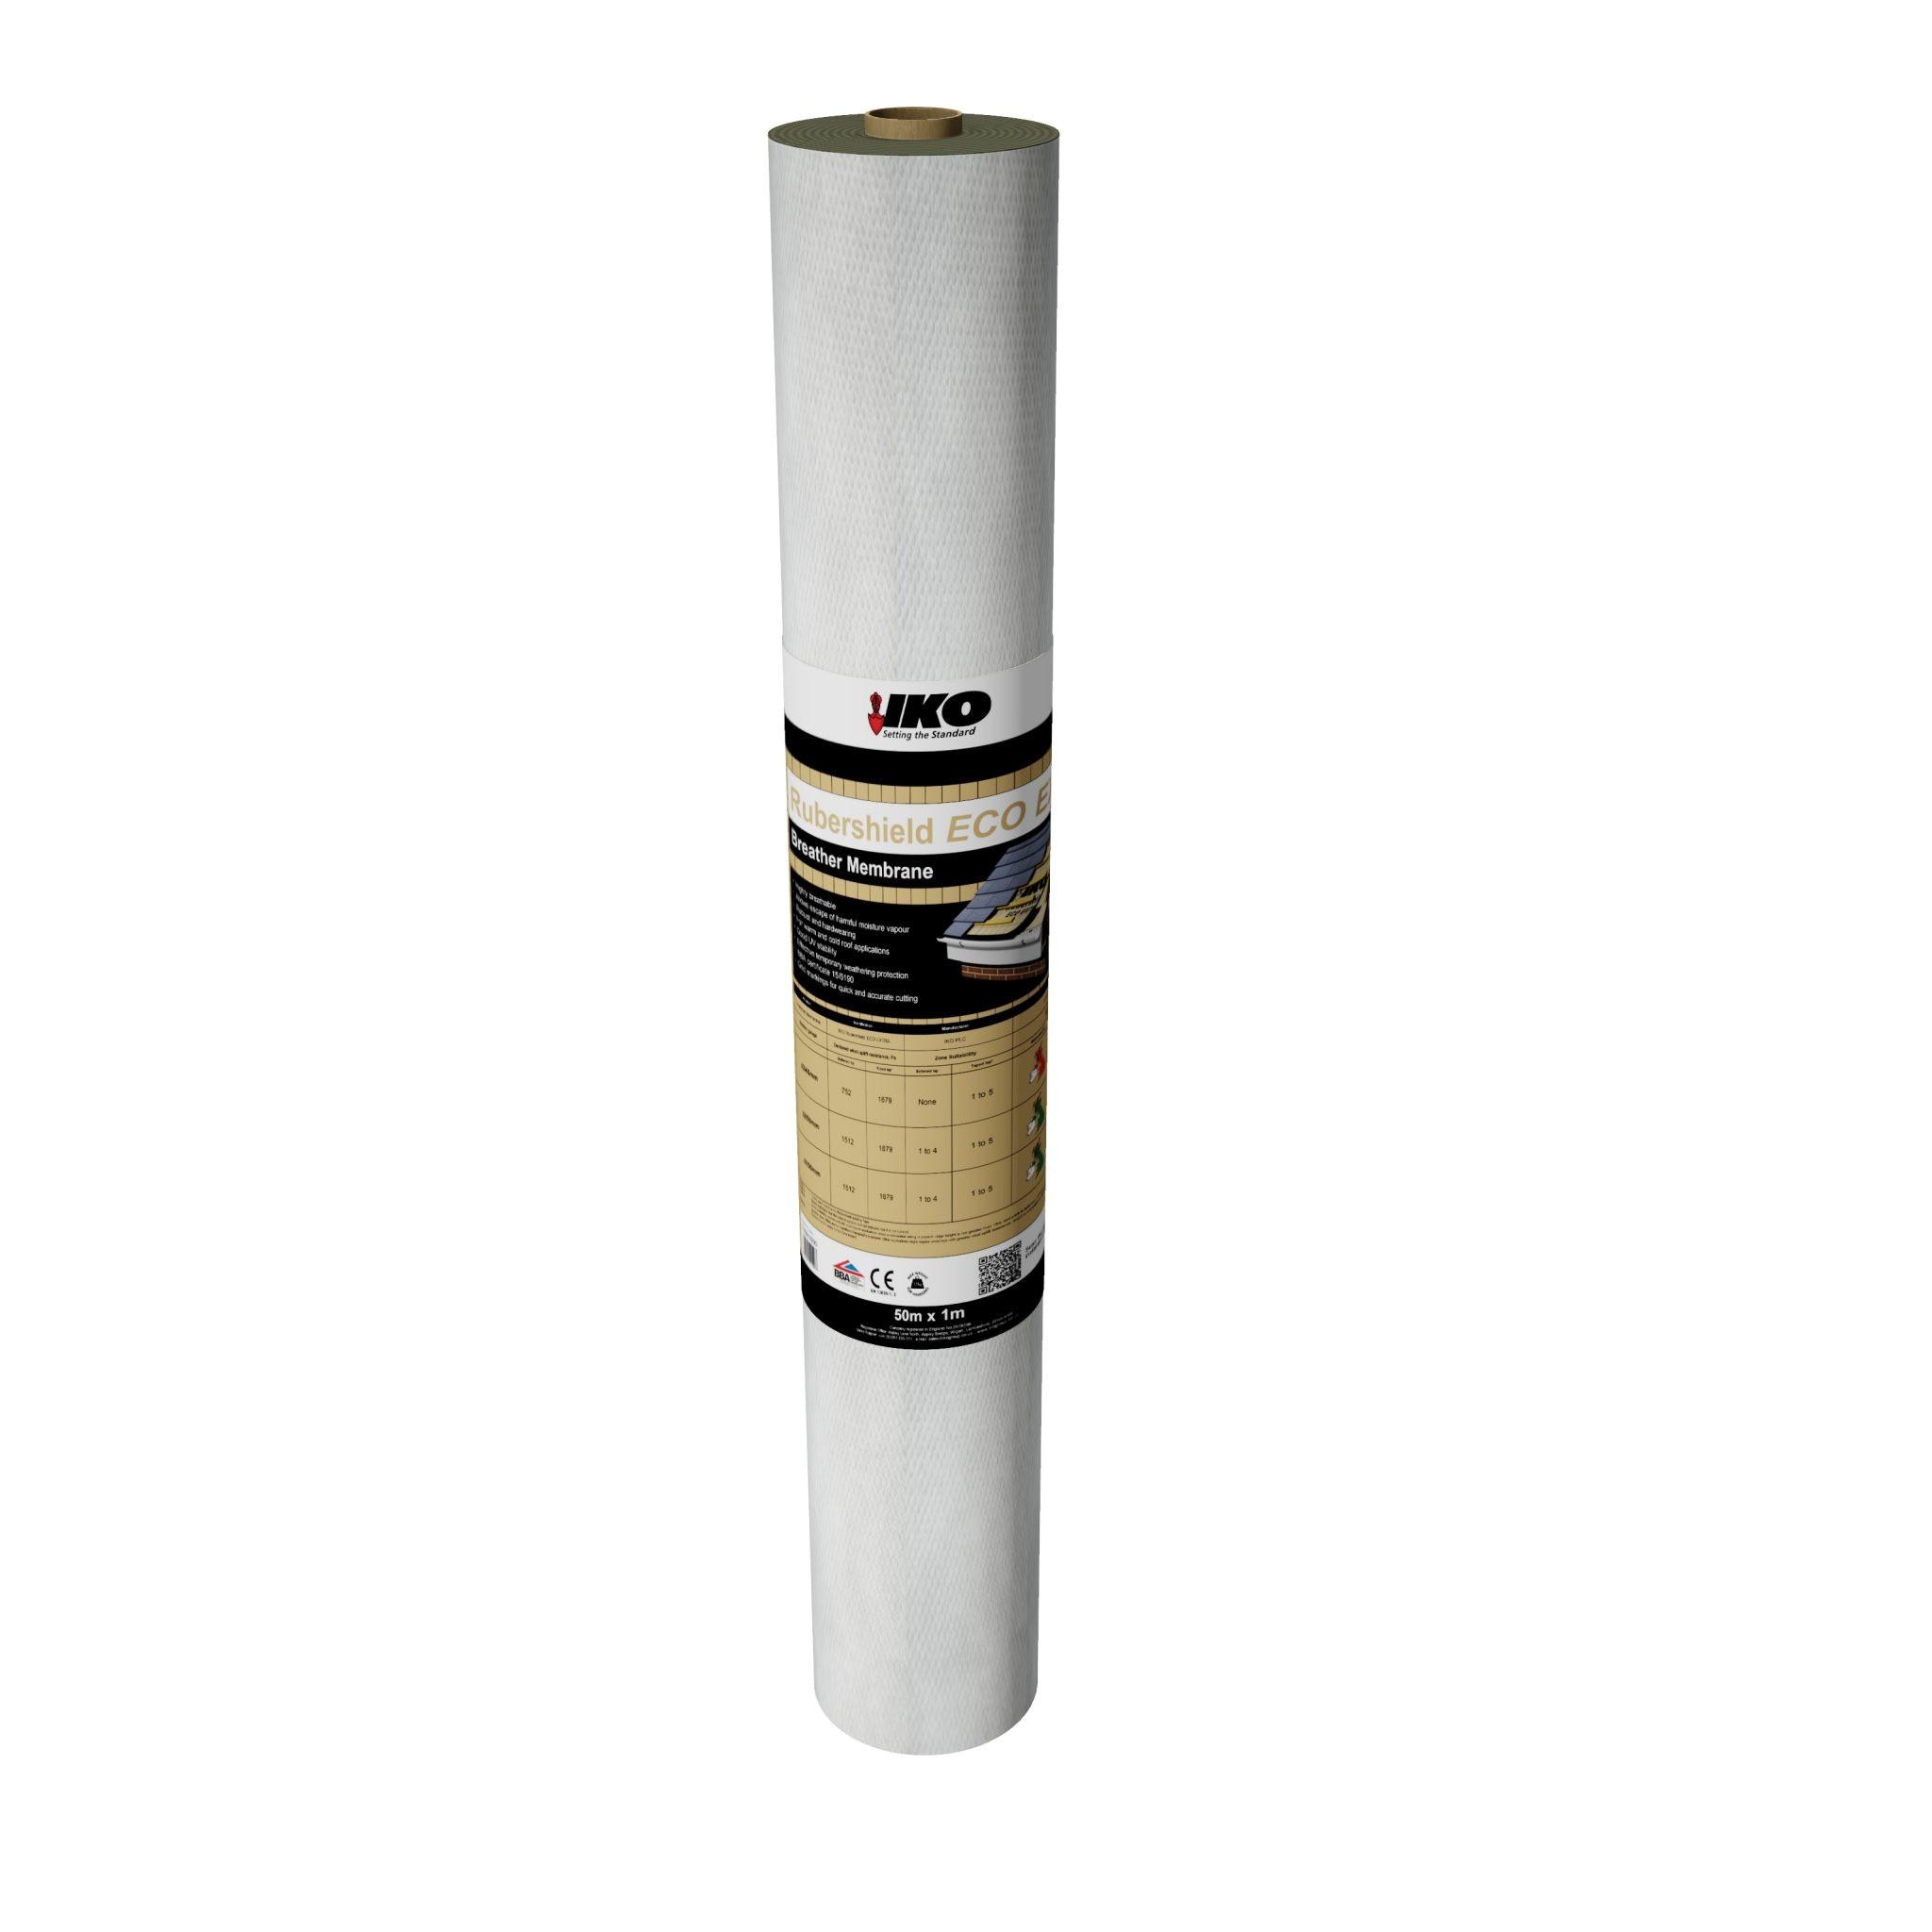 Rubbershield Eco Extra Breather Membrane 50x1.5mtr